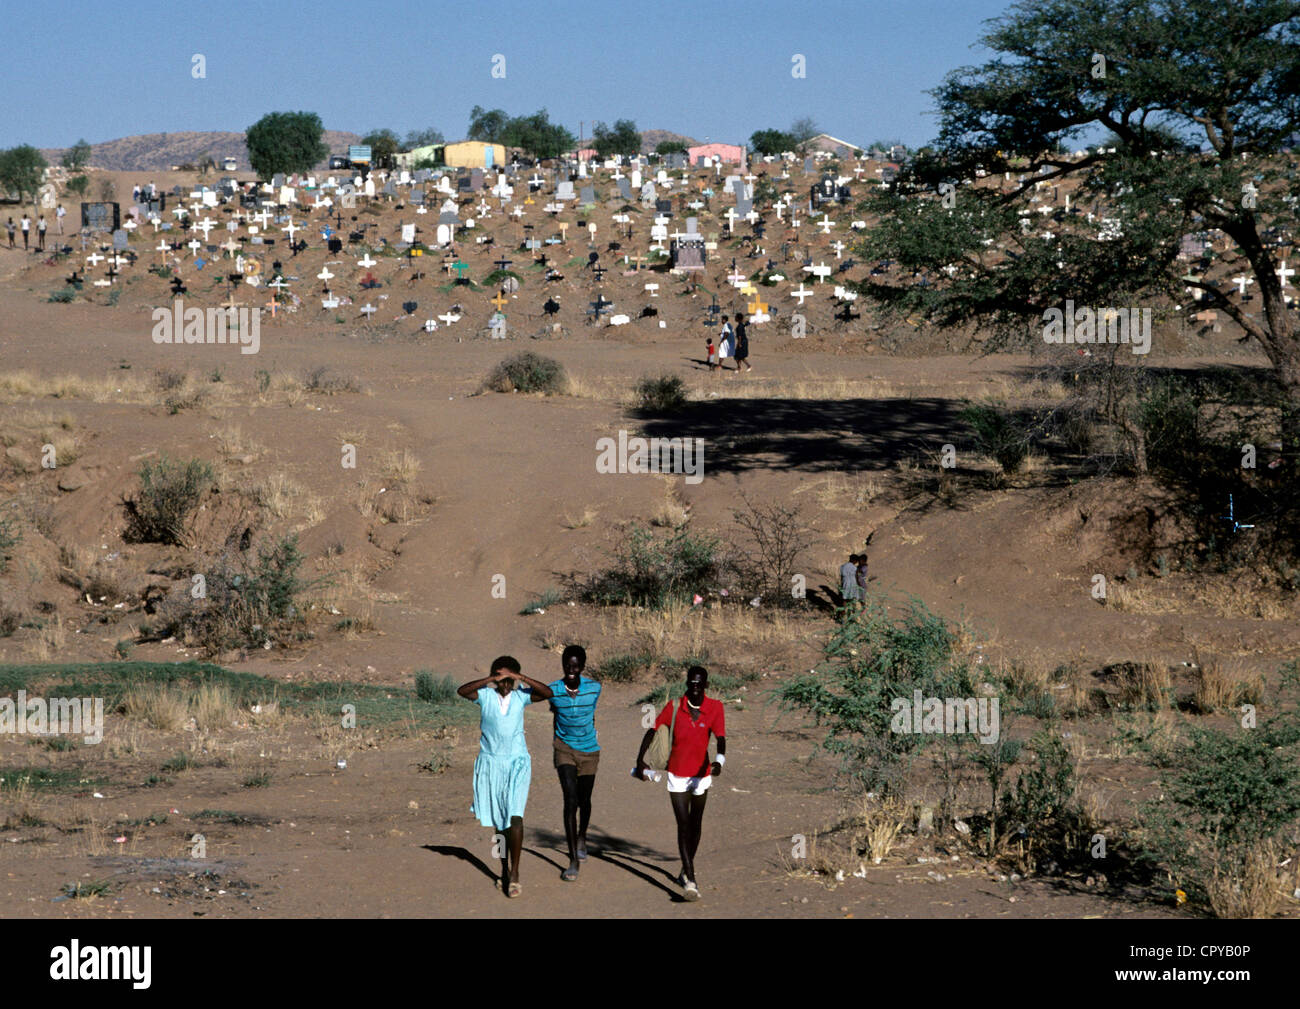 Namibia, Windhoek, Township of Katutura - Stock Image